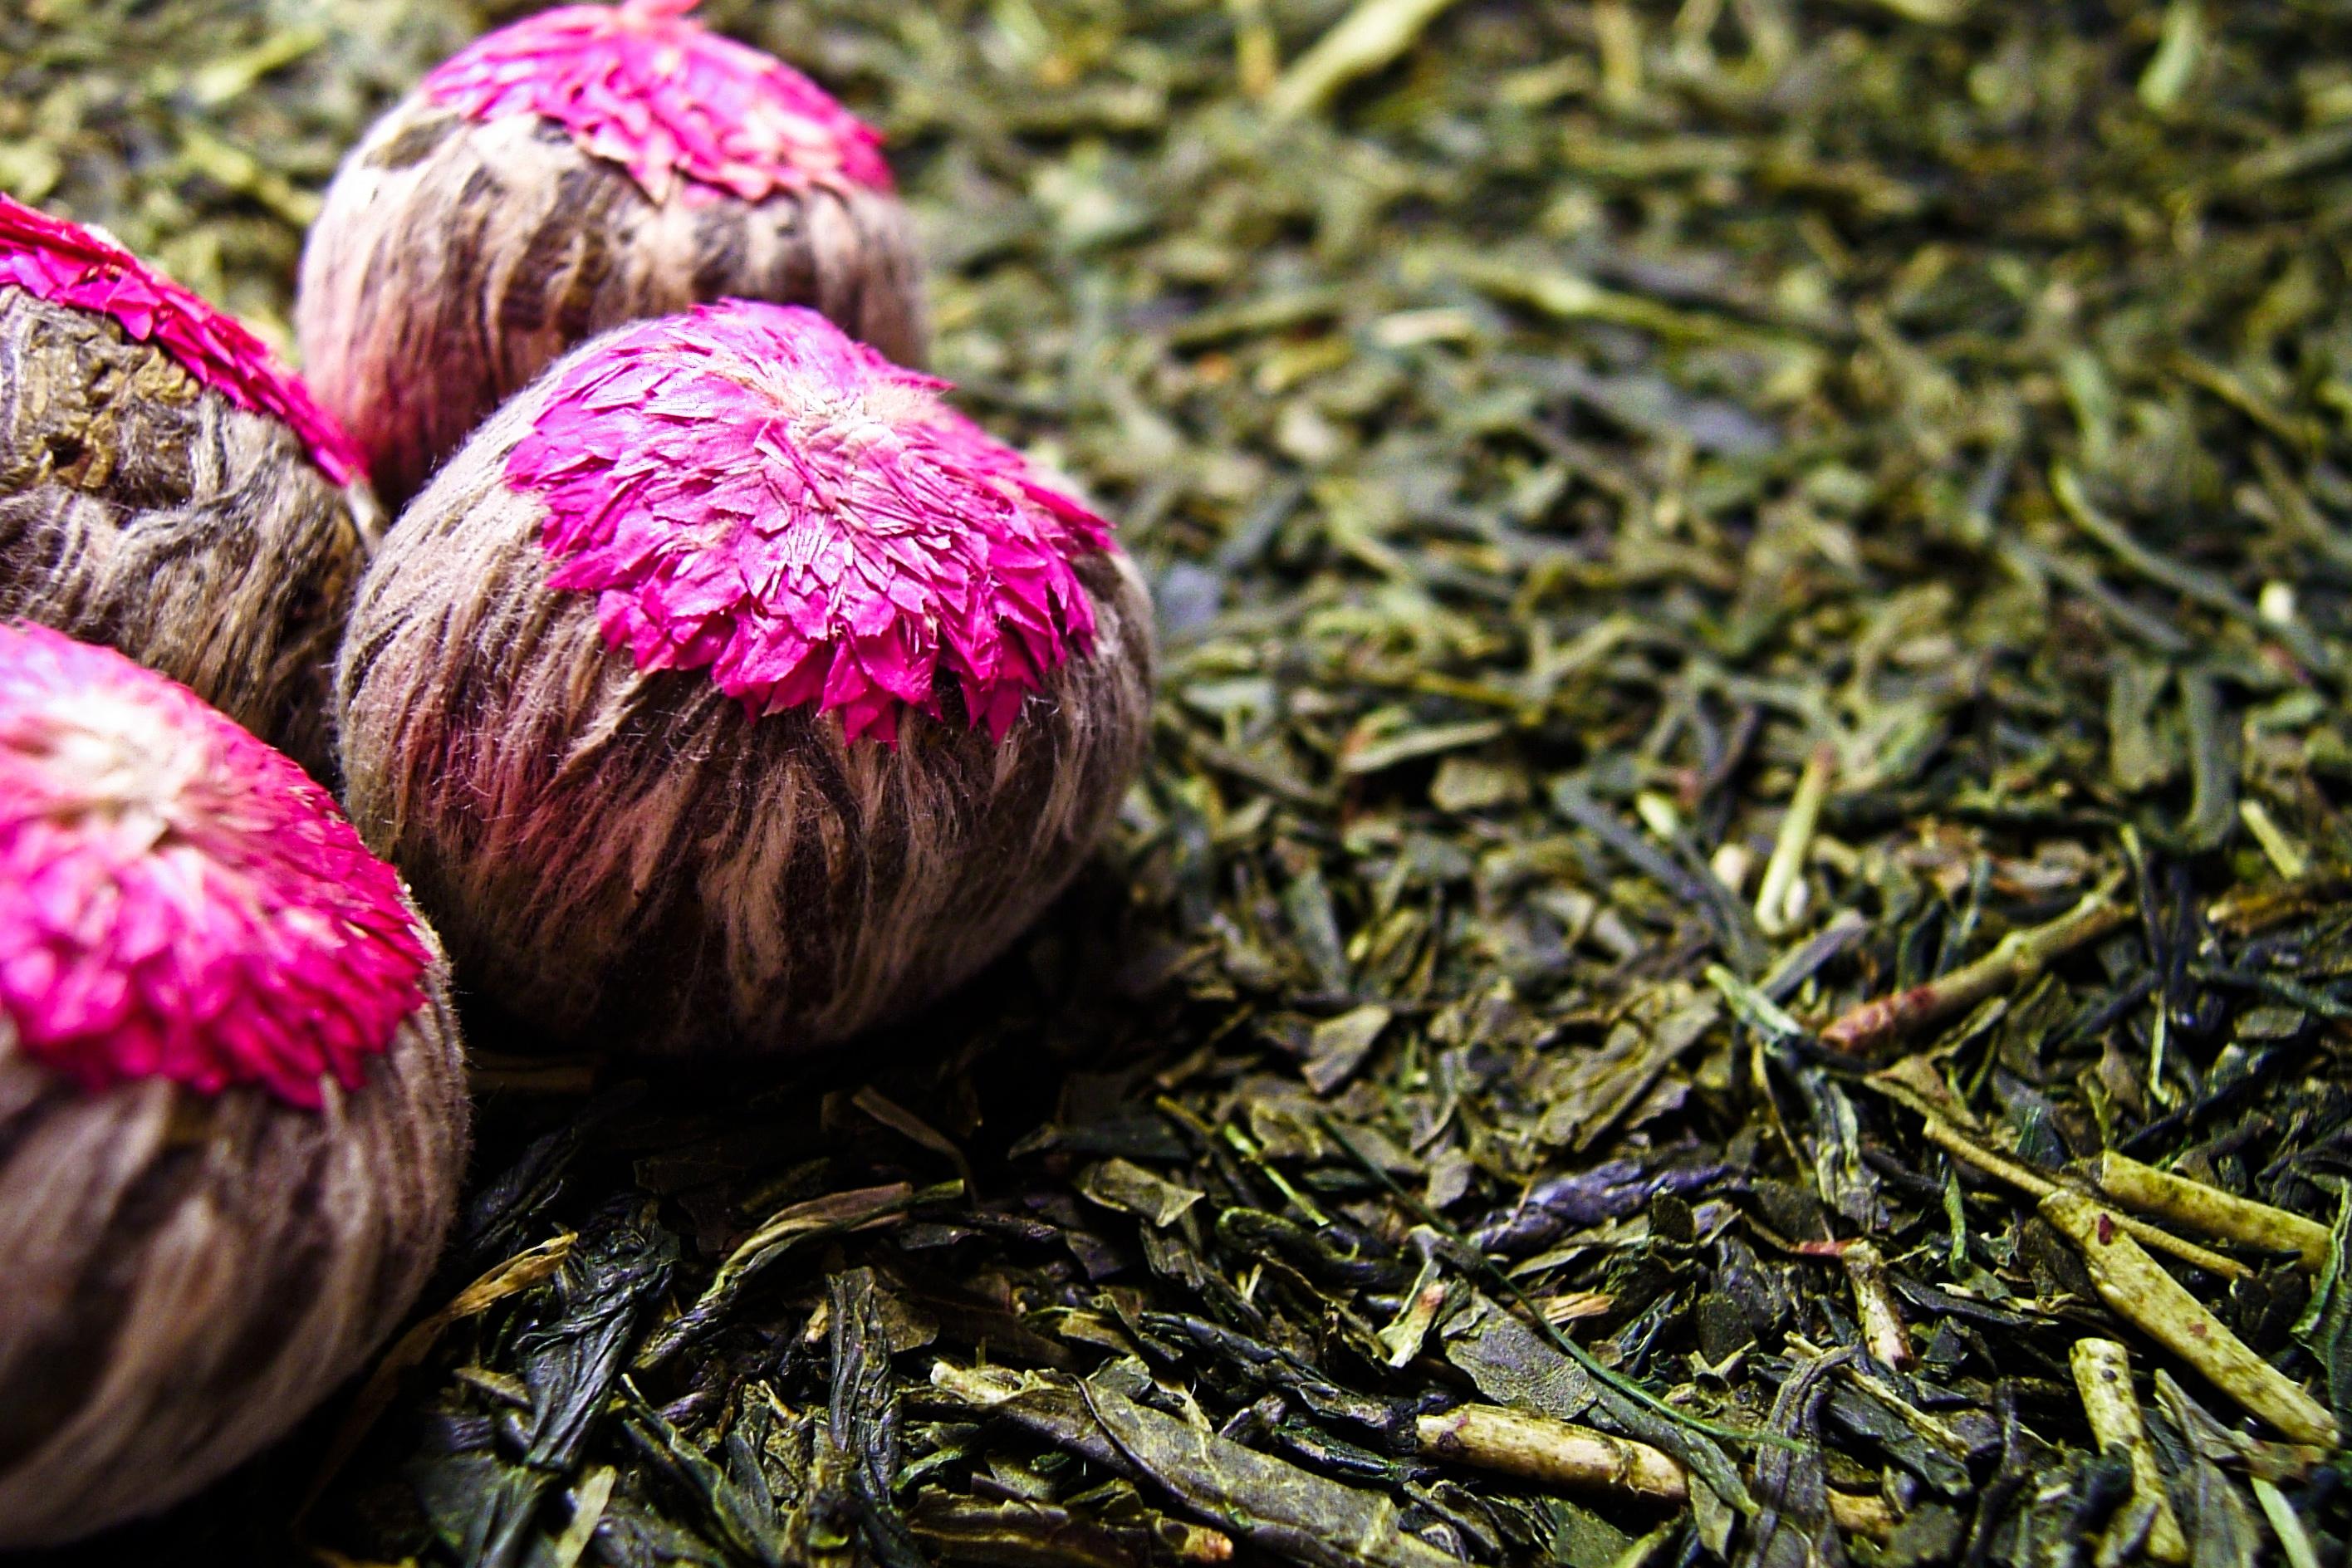 tè al gelsomino (jasmine tea)